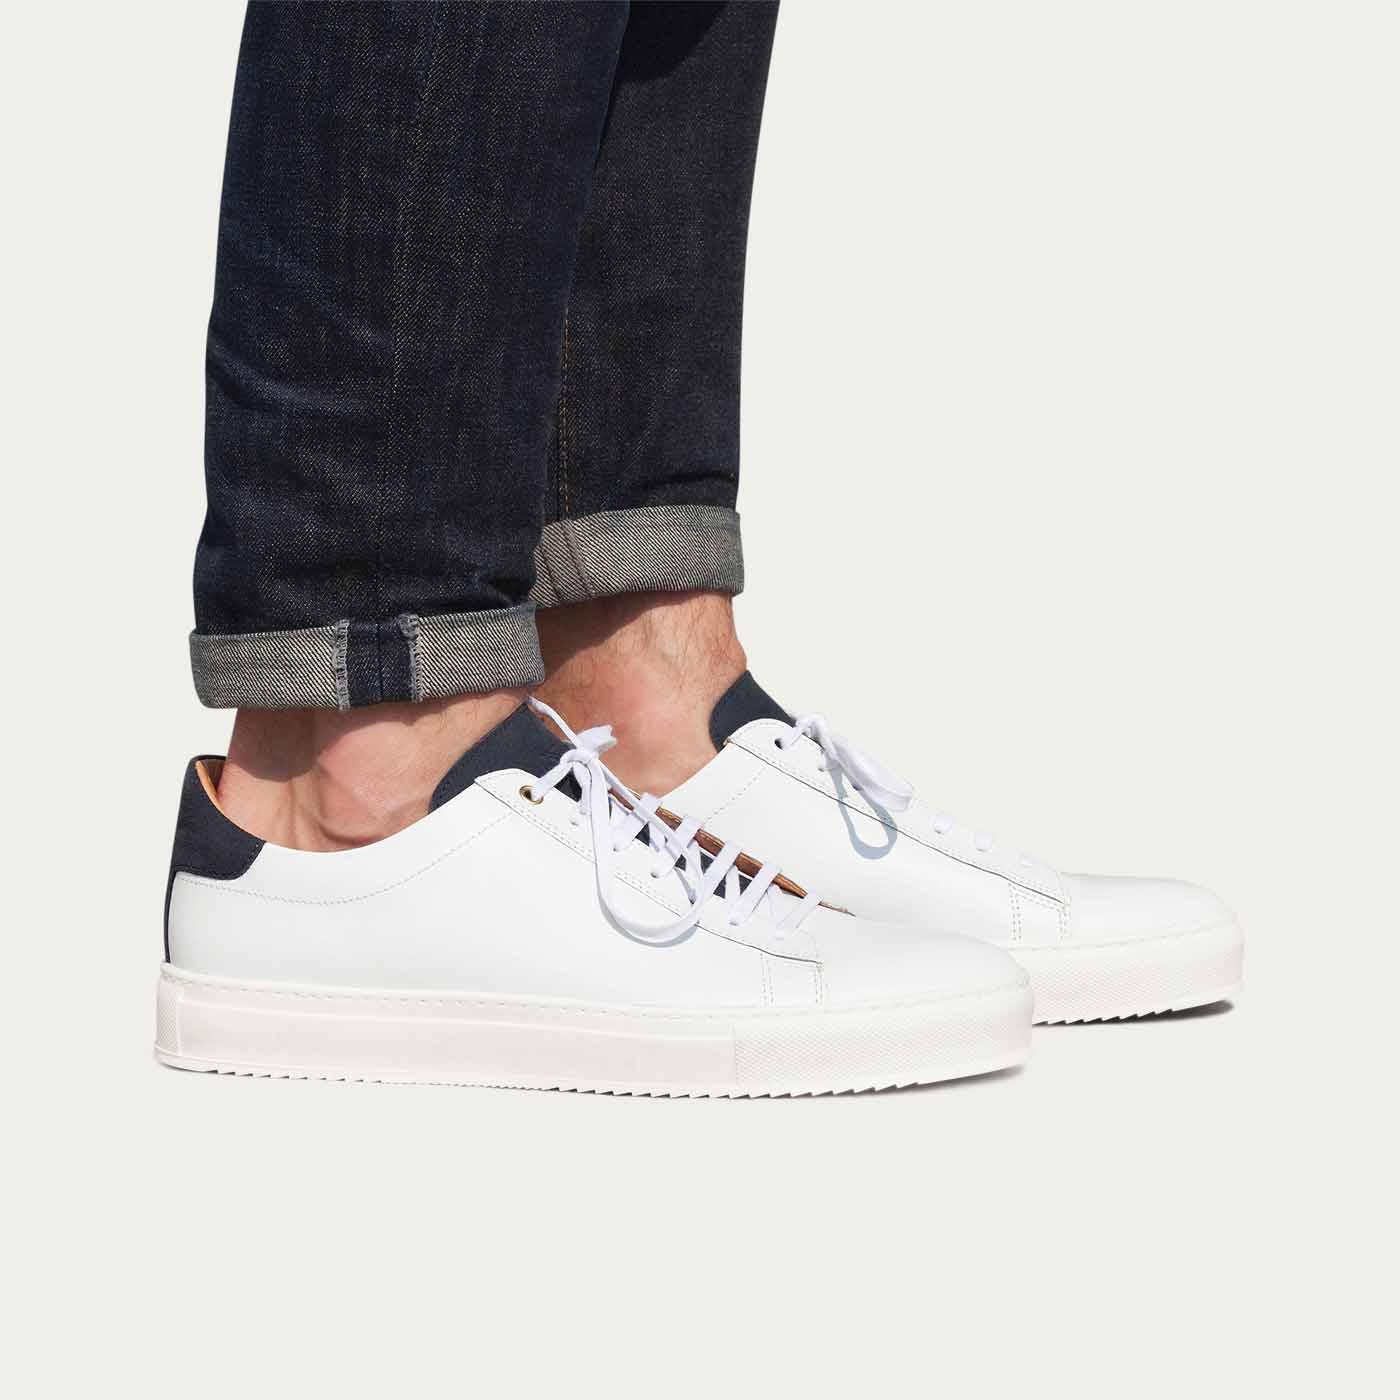 Porte Bleue Calf Taranta Sneakers 4